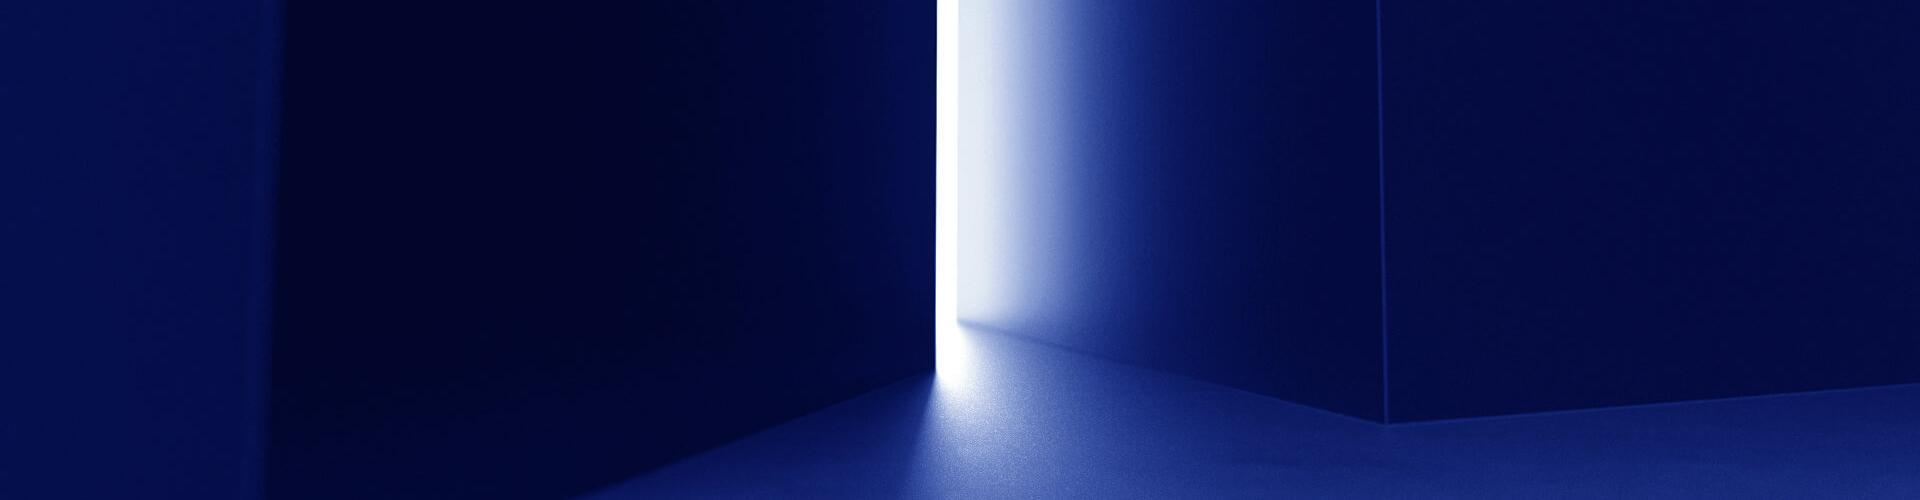 rra-background-blue-2-2021.jpg